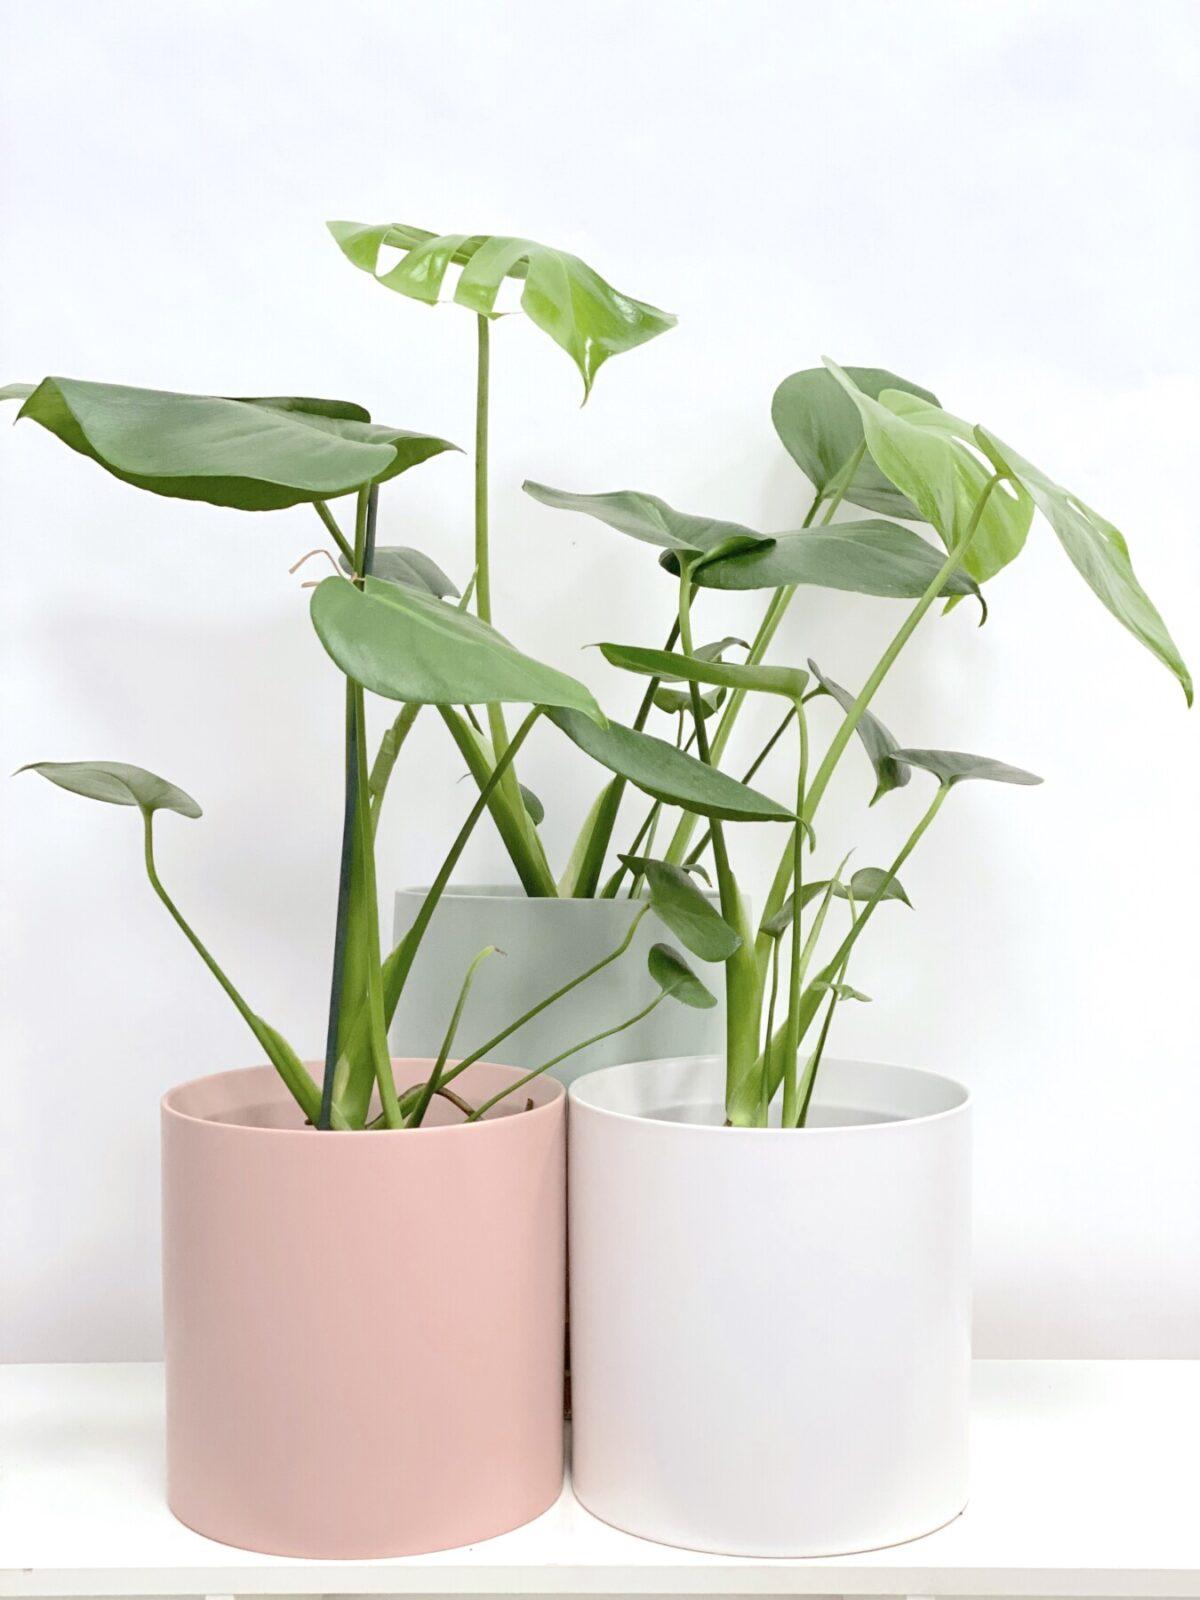 Plants: Energy | Order Online Flower Delivery Melbourne, Thrive Flowers